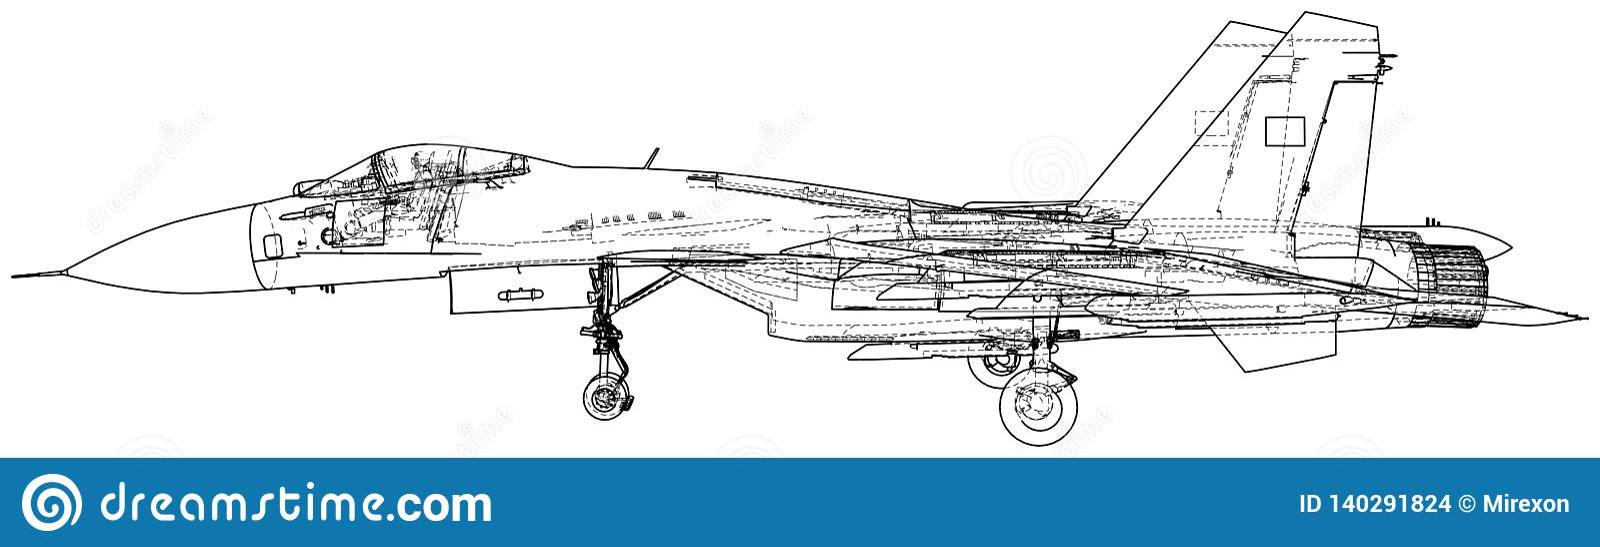 Wondrous Military Plane Fighter Jet Vector Illustration Created Wiring Digital Resources Funapmognl